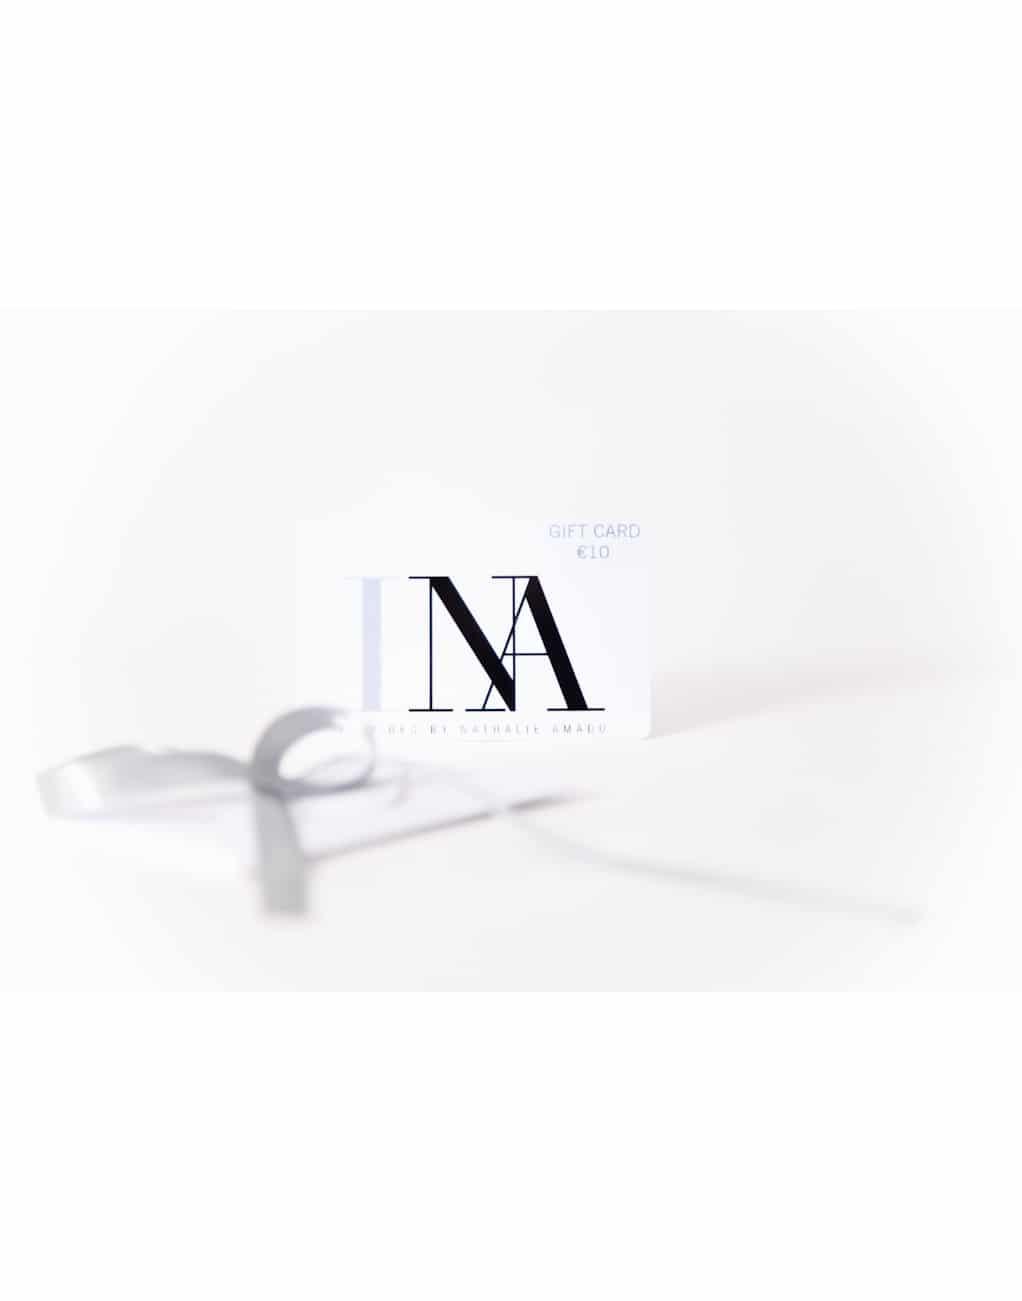 www.nathalieamado.com-gift cards